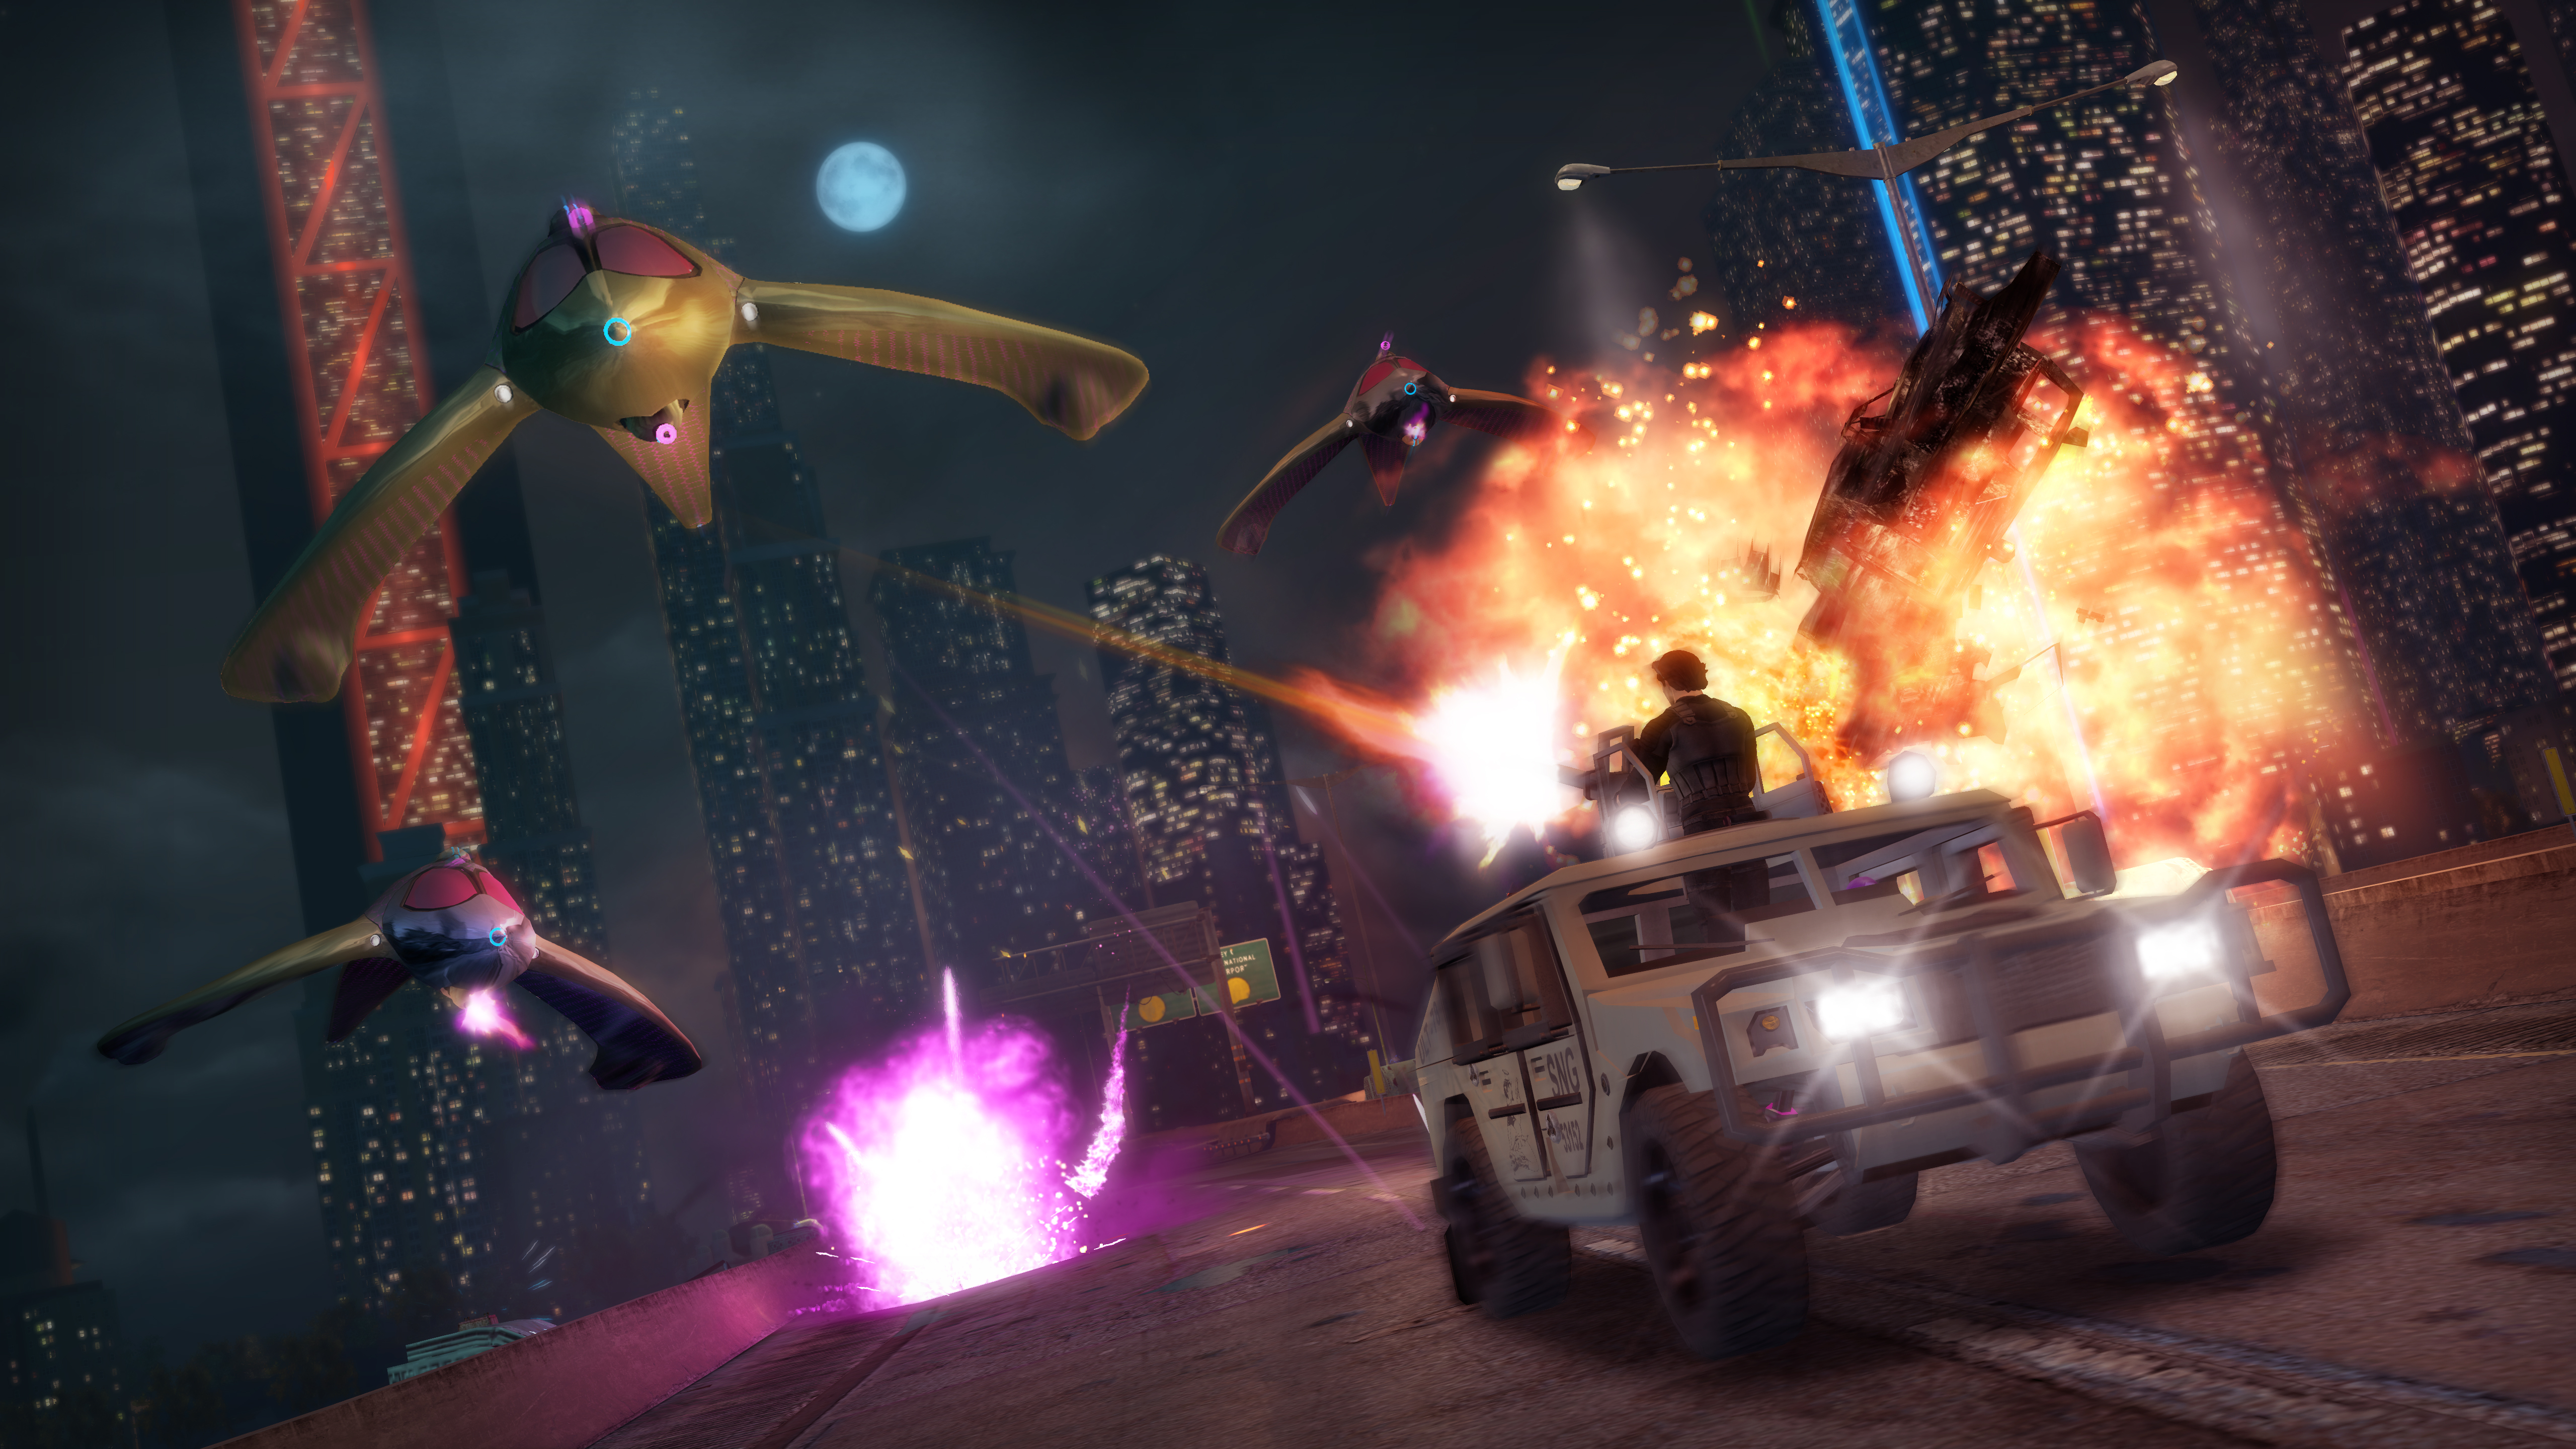 Saints Row: The Third - Gangstas in Space screenshot